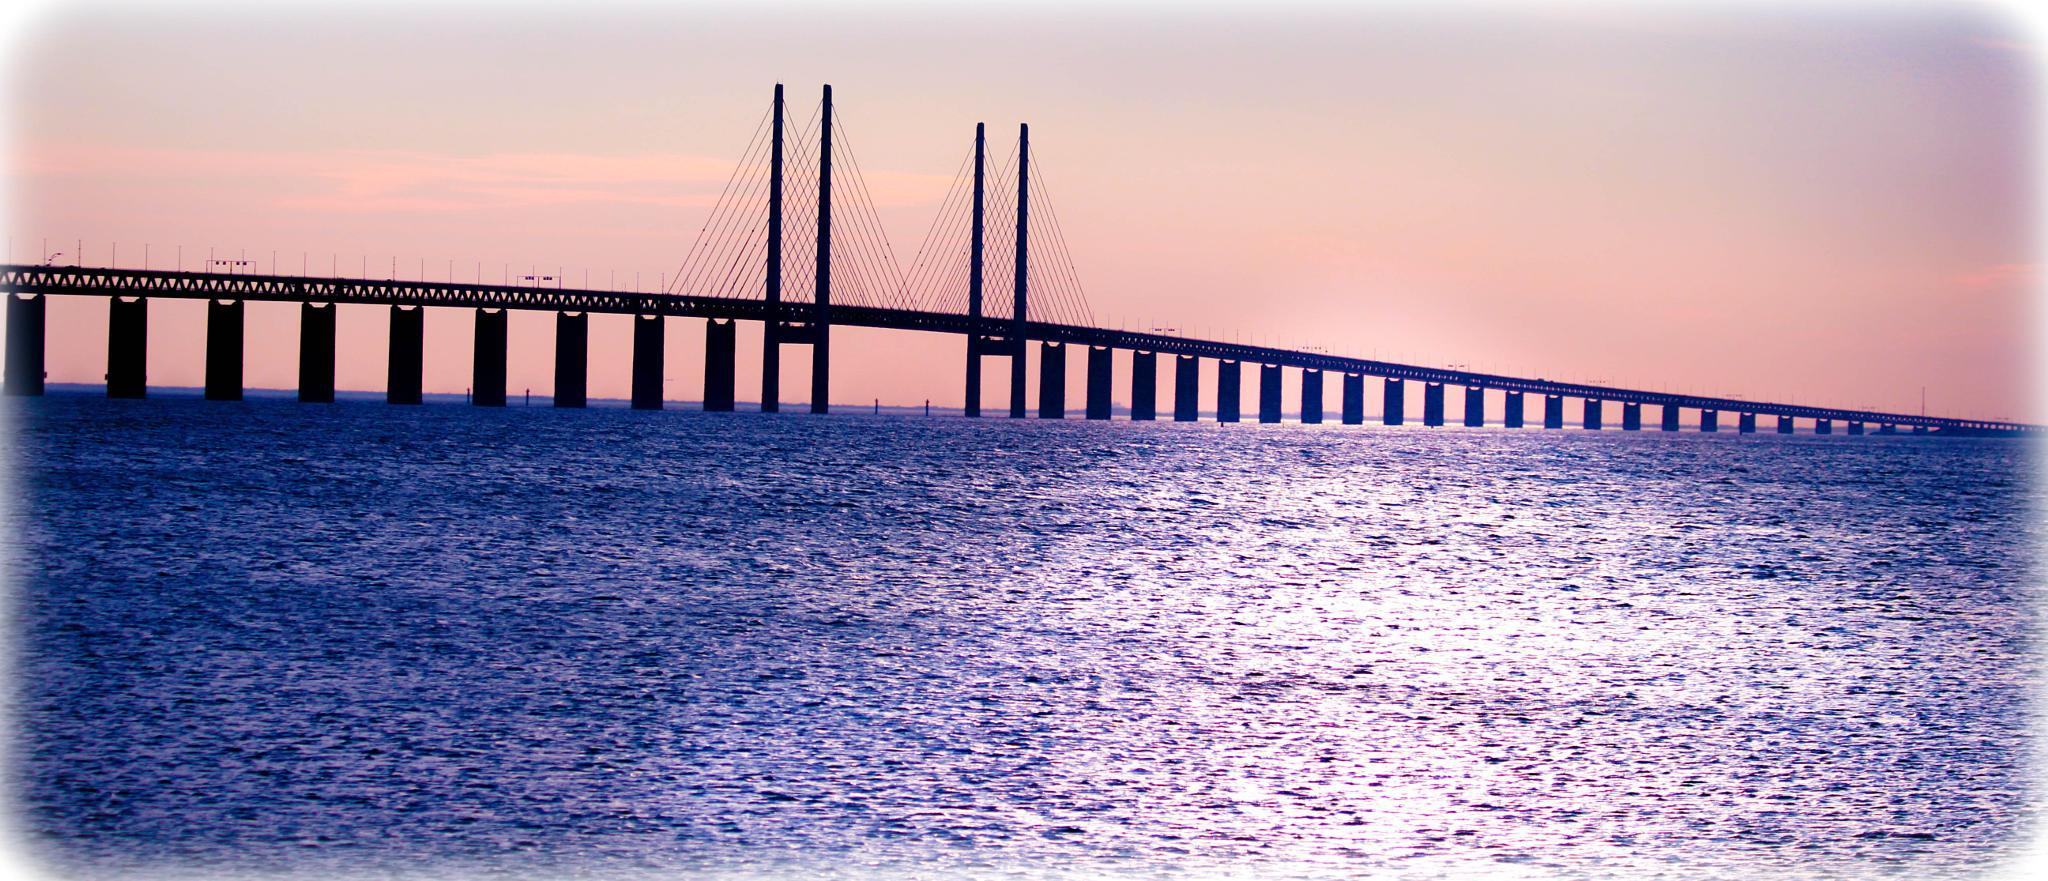 bridge by Karina Eyre